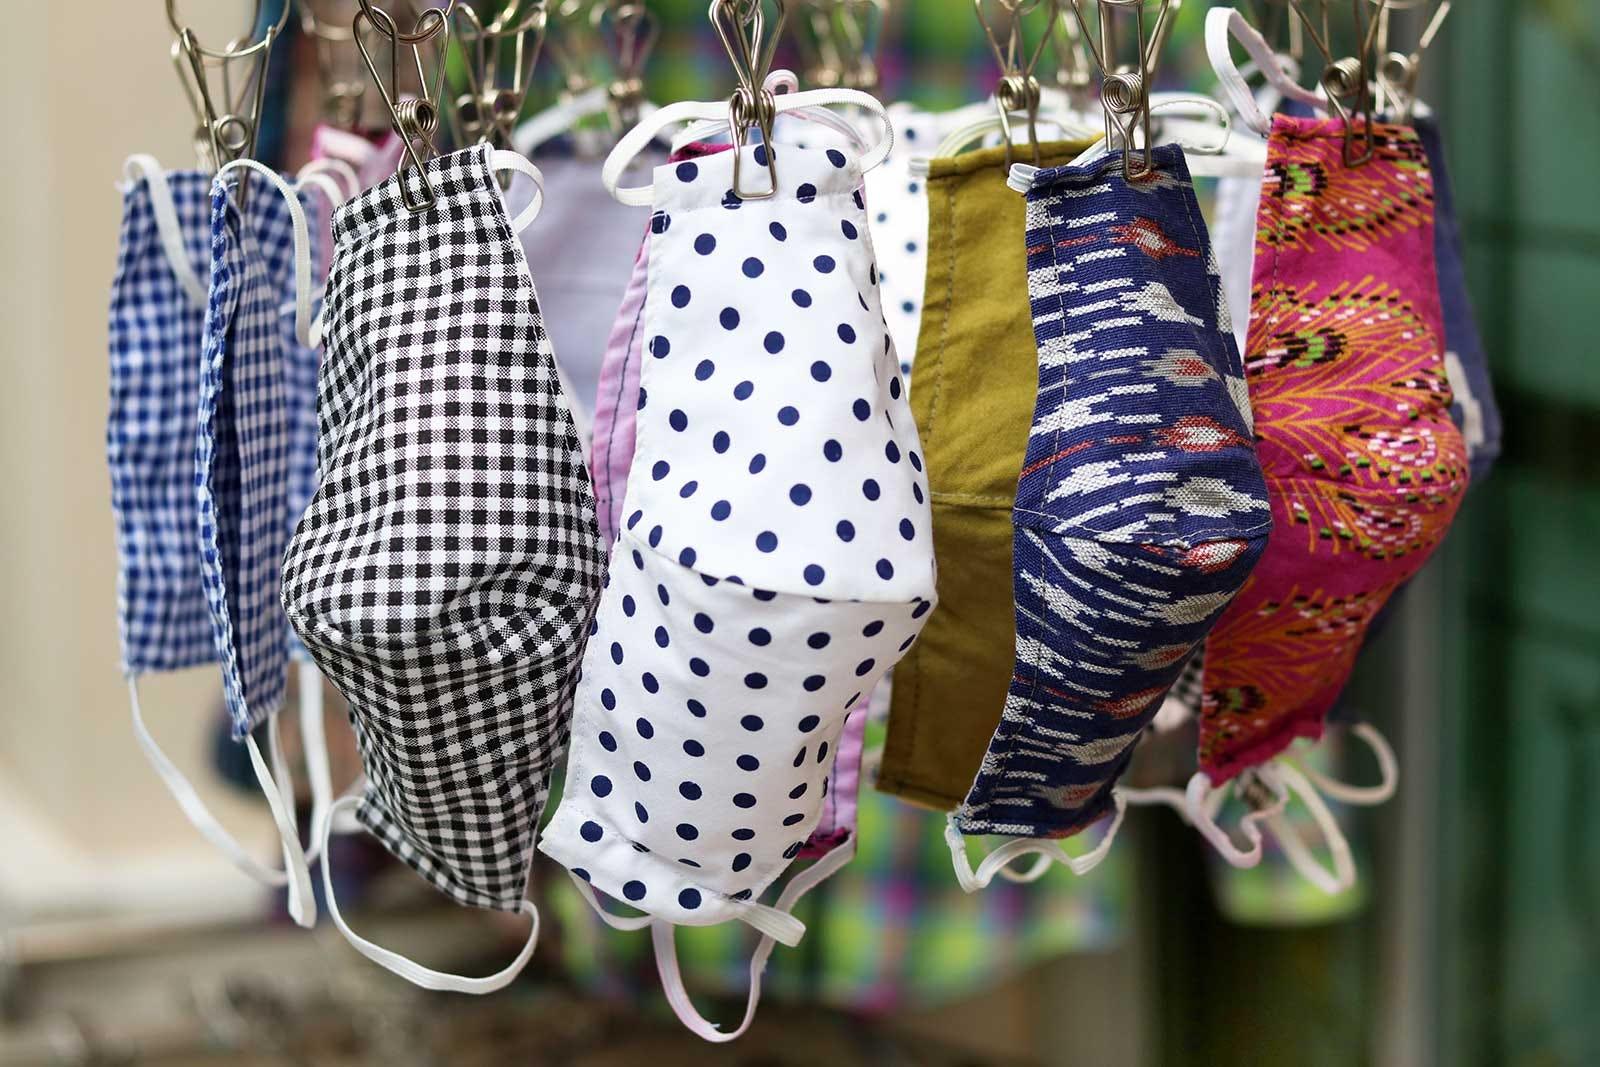 Cloth masks hang drying on a small drying rack.